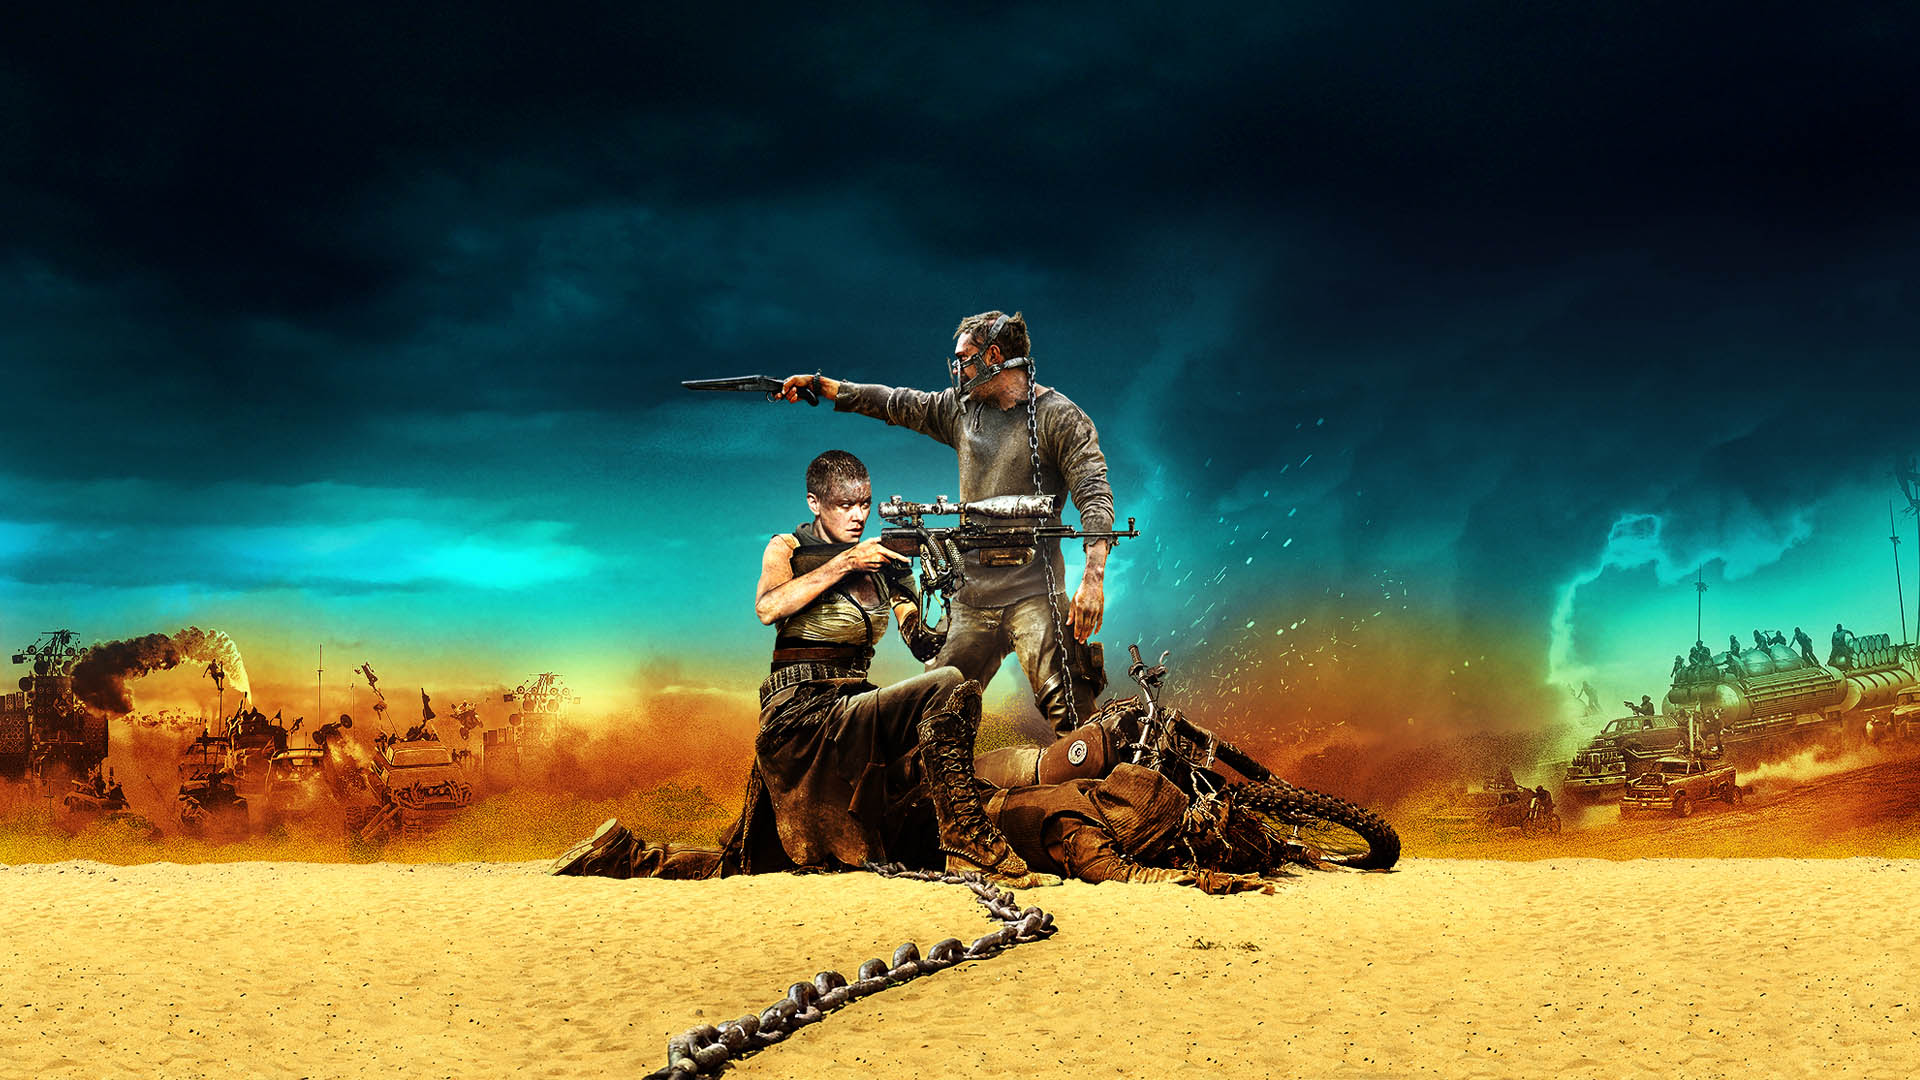 Mad Max: Fury Road Amazing Movie Poster - 1920x1080 - Full HD 16/9